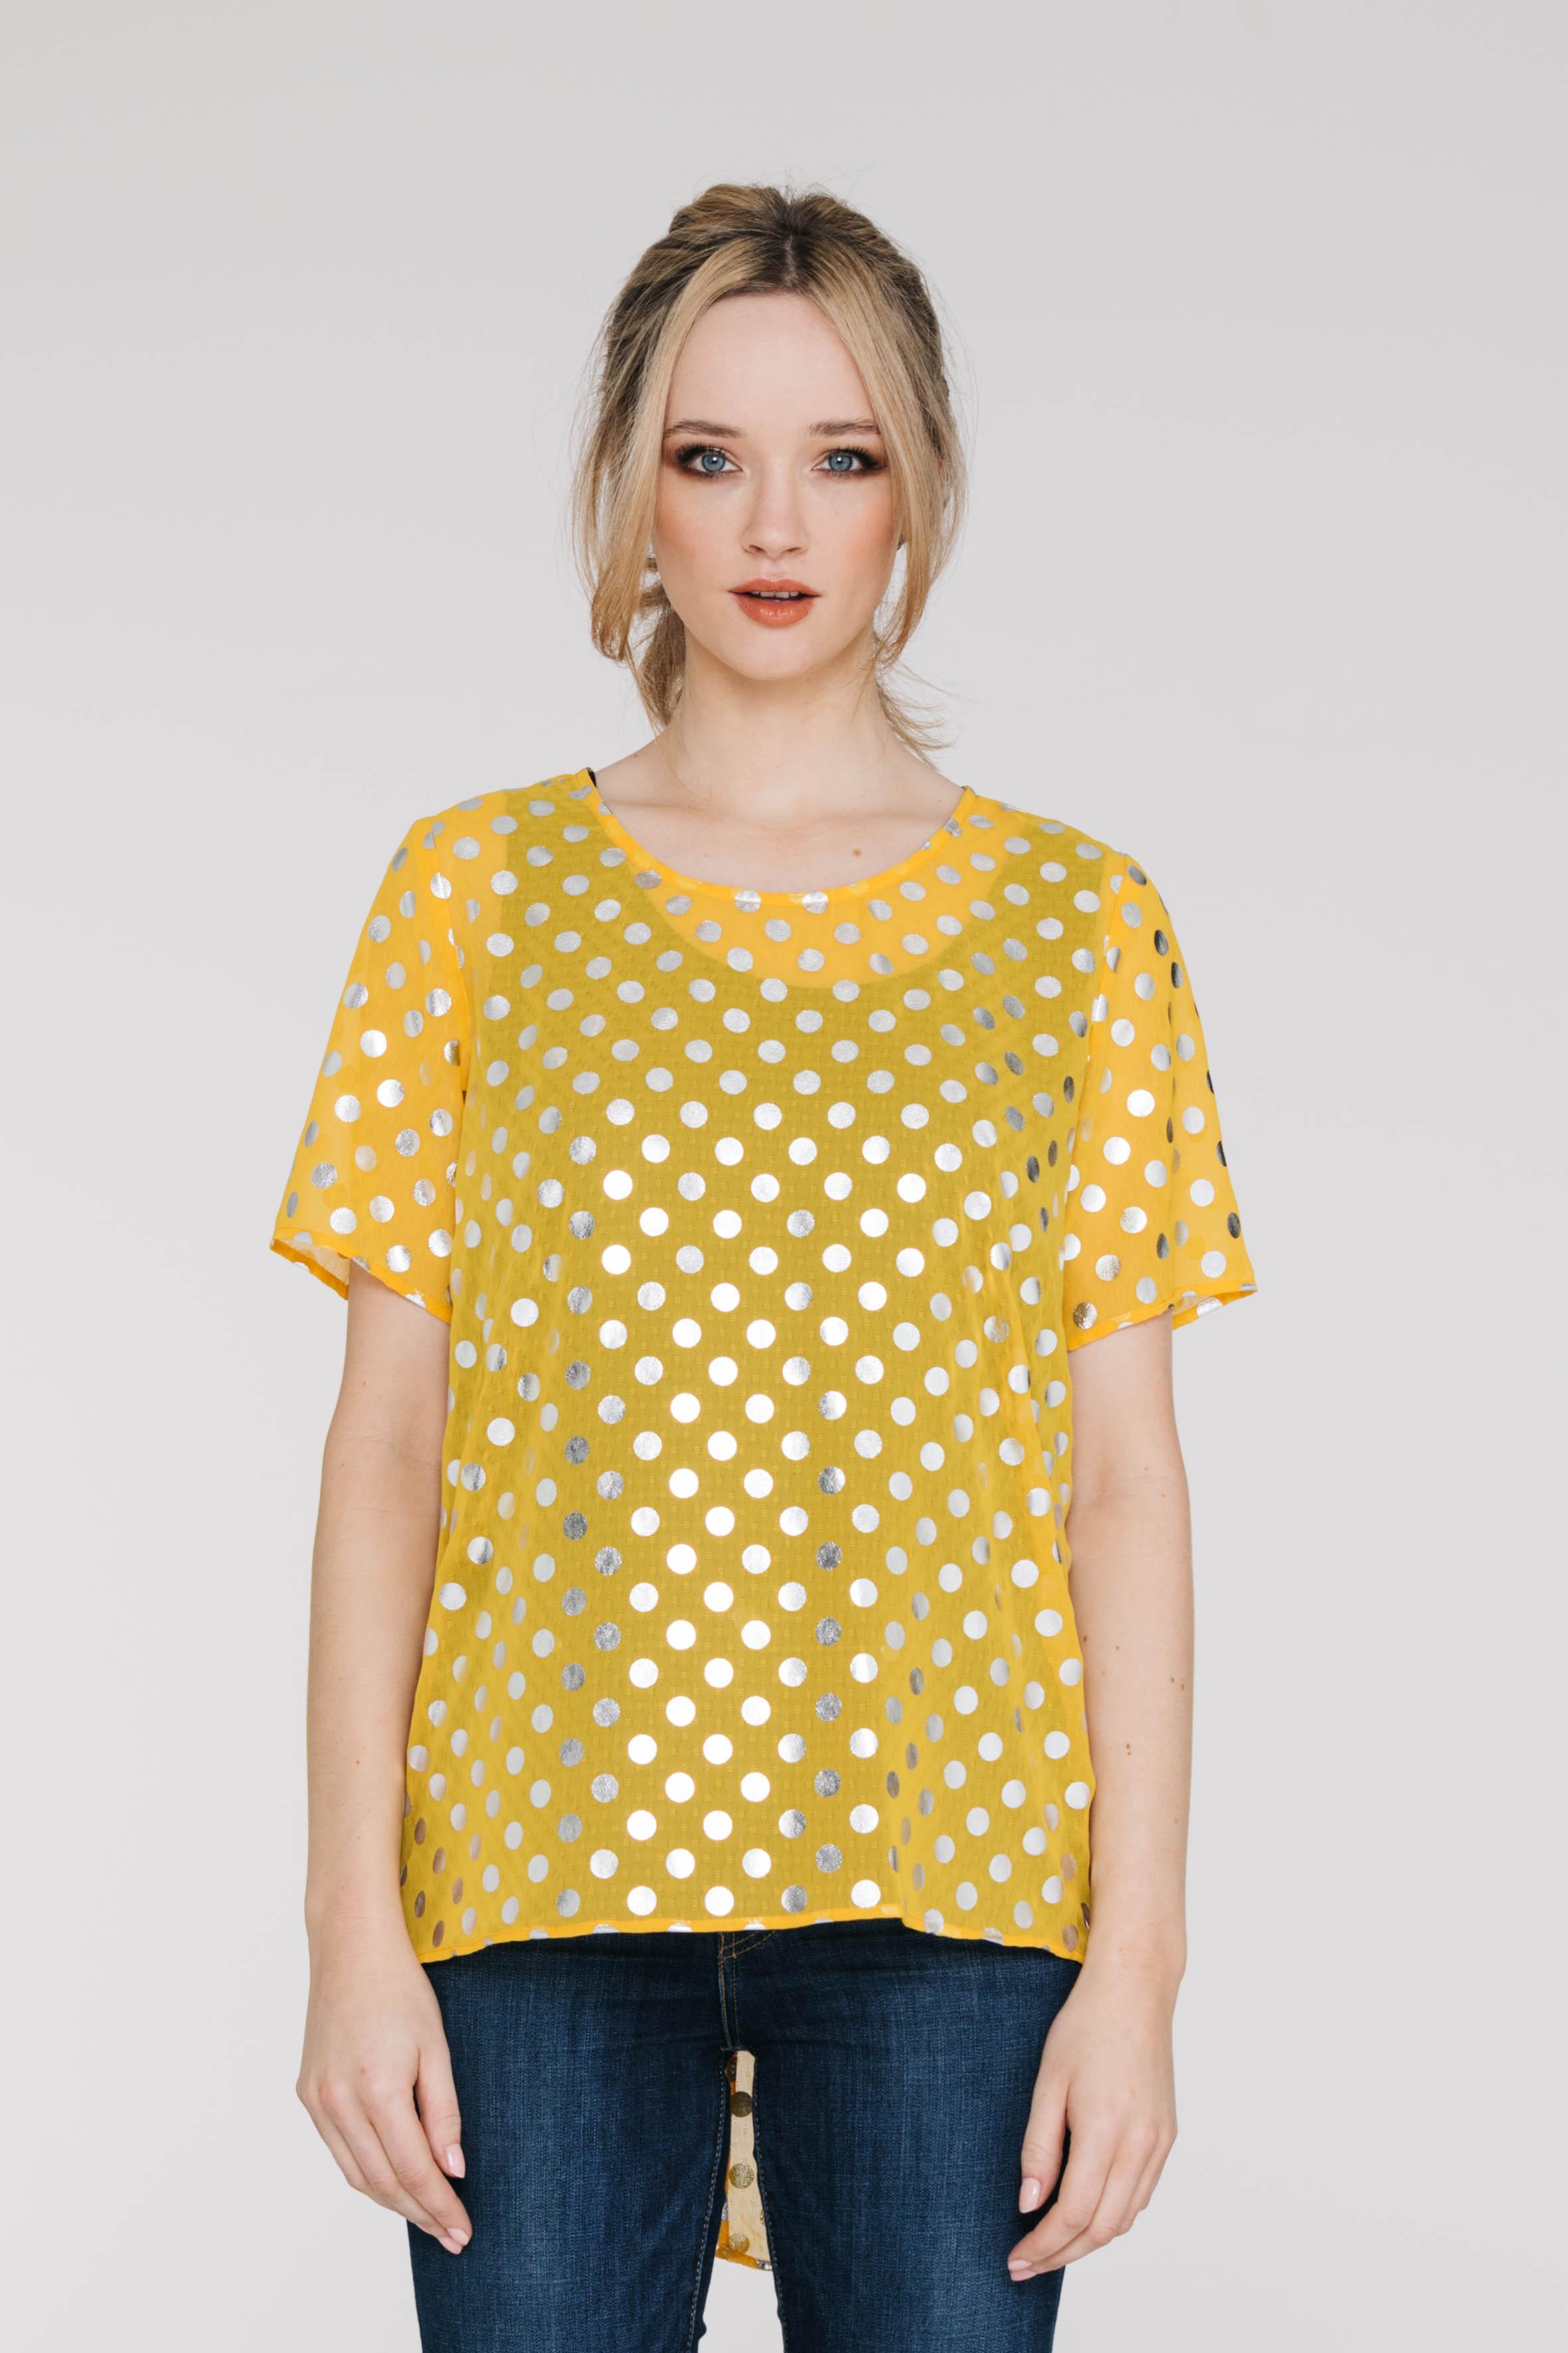 New Tux Tee 5173N Silver Spot Yellow